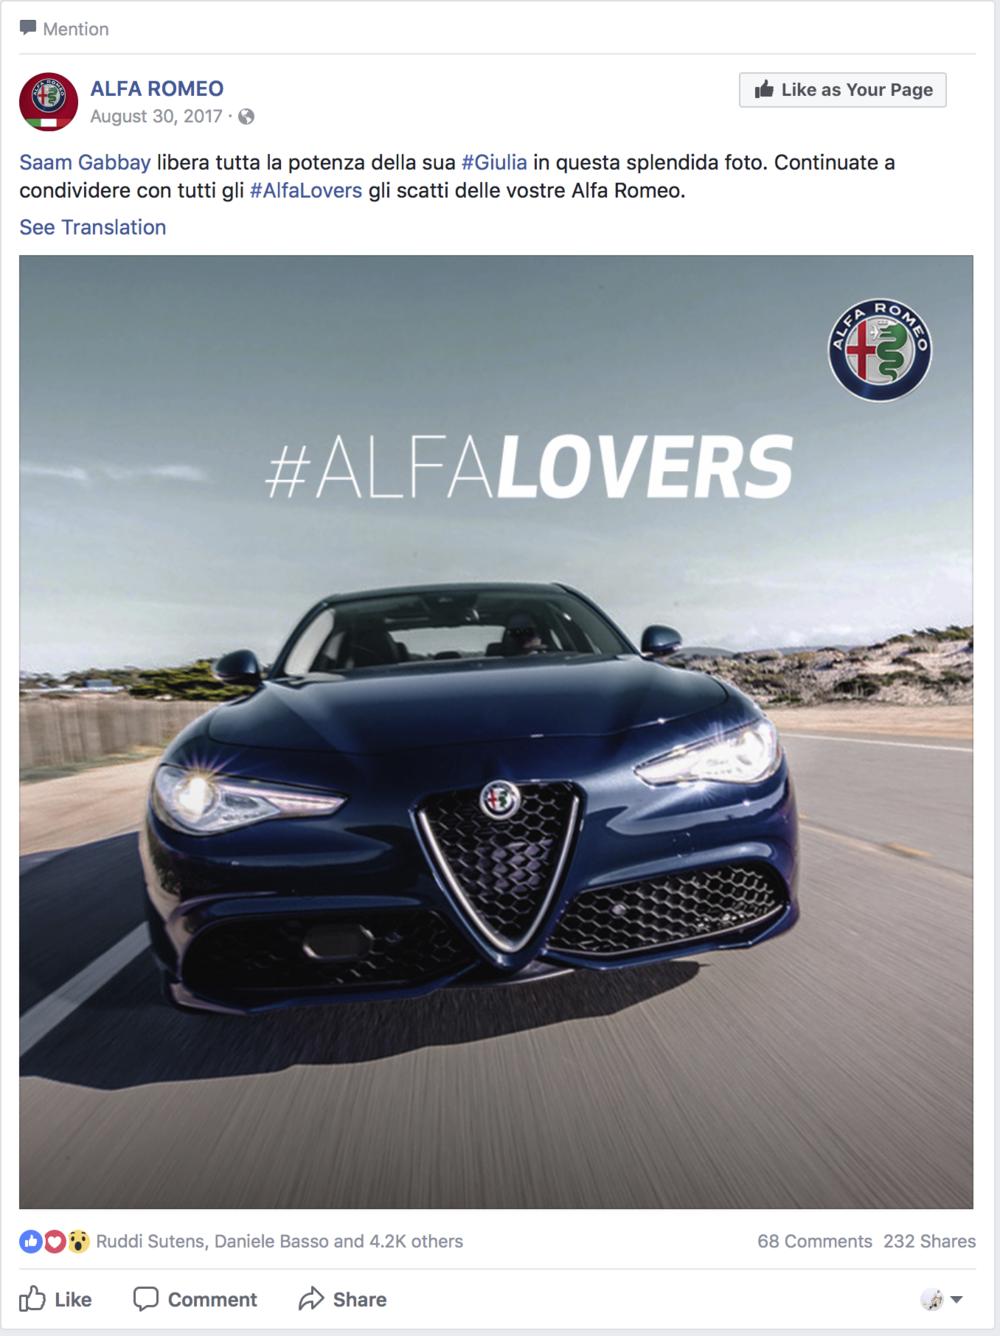 Alfa_Romeo_Social_Media_Mention.png